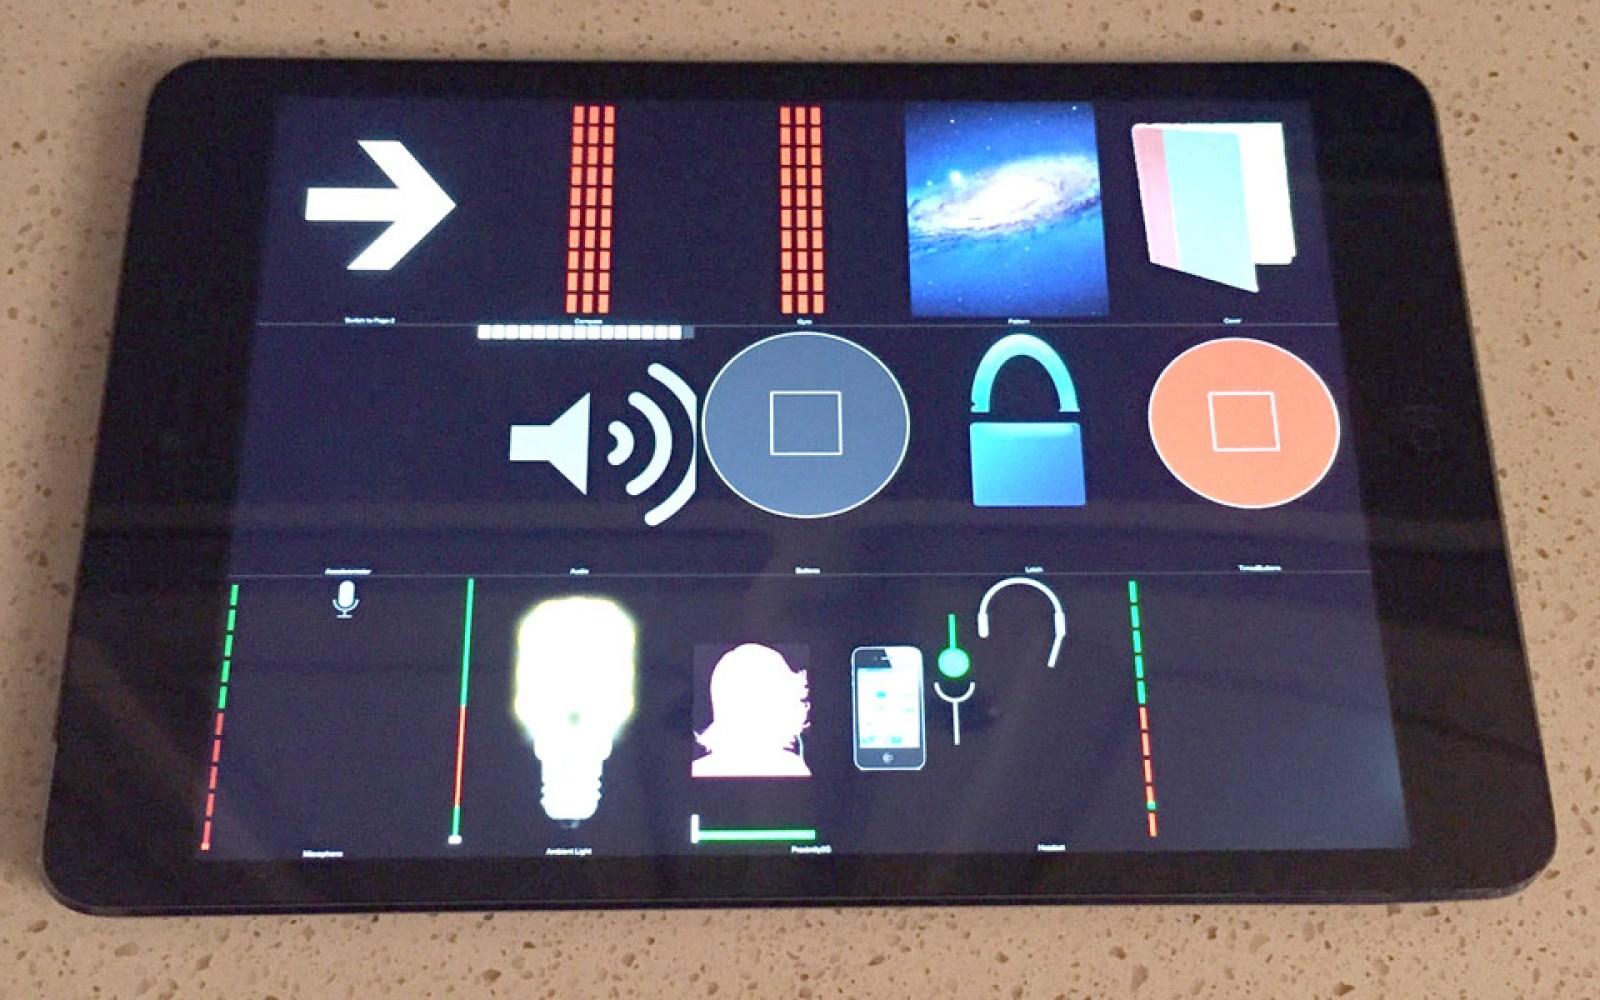 Claimed prototype of iPad mini 2 goes on sale on eBay with starting bid of $5000